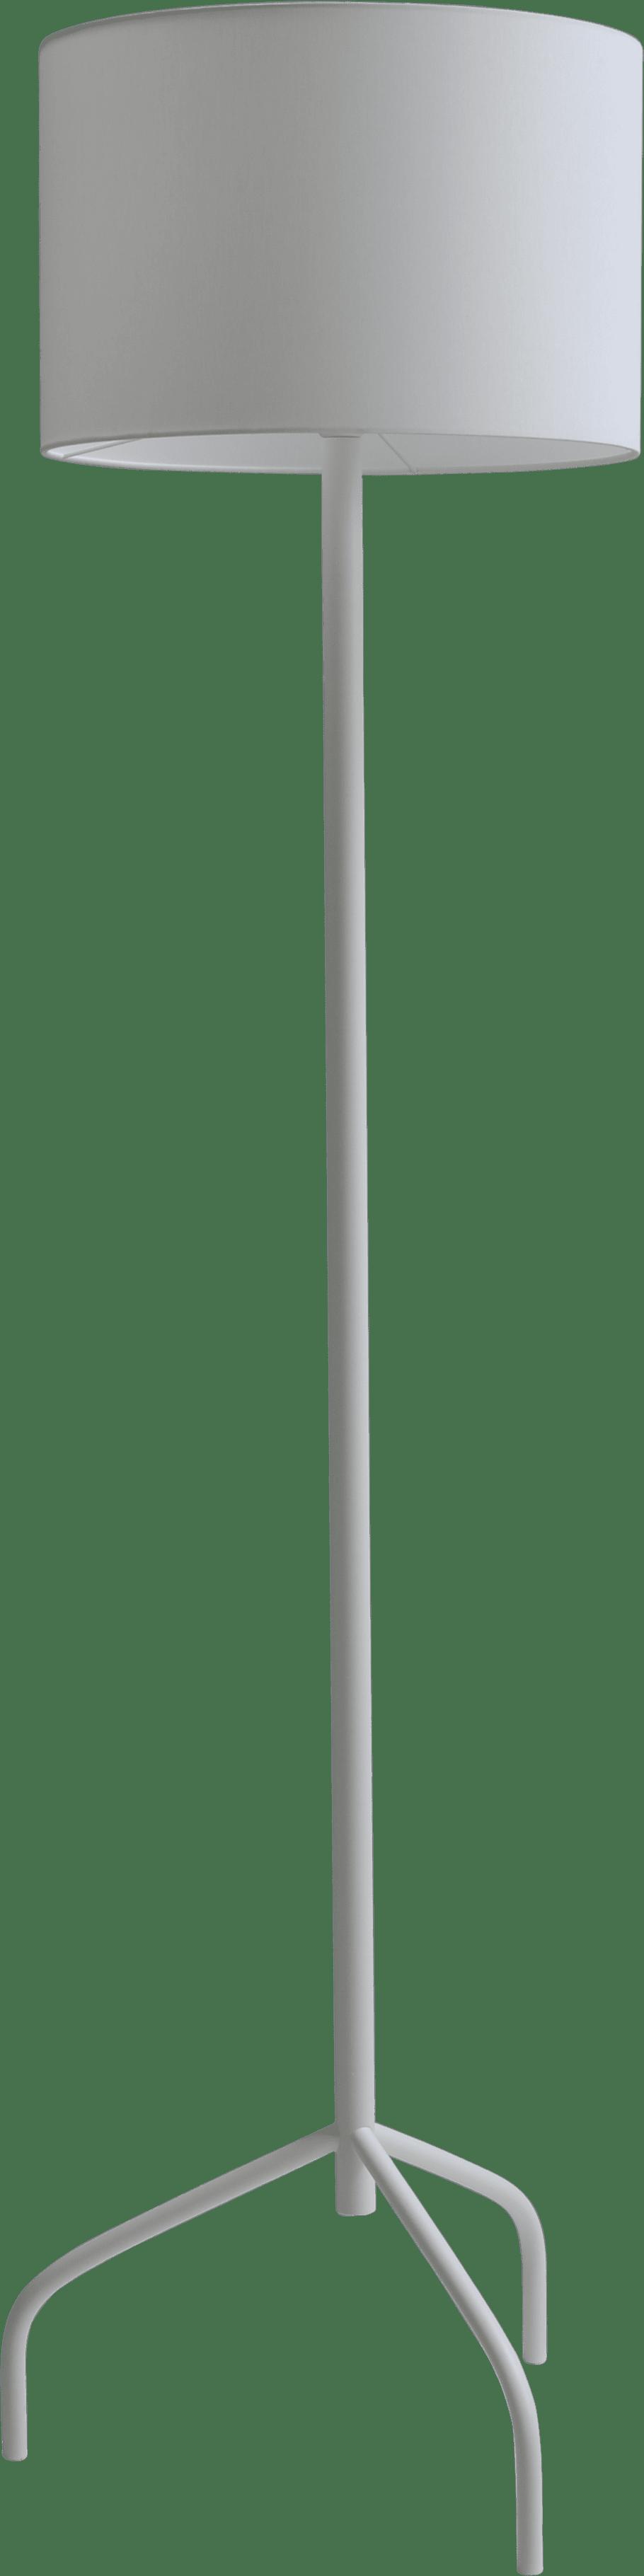 Cross VL CROSS DRIP WHITE STRUCT. H.154CM